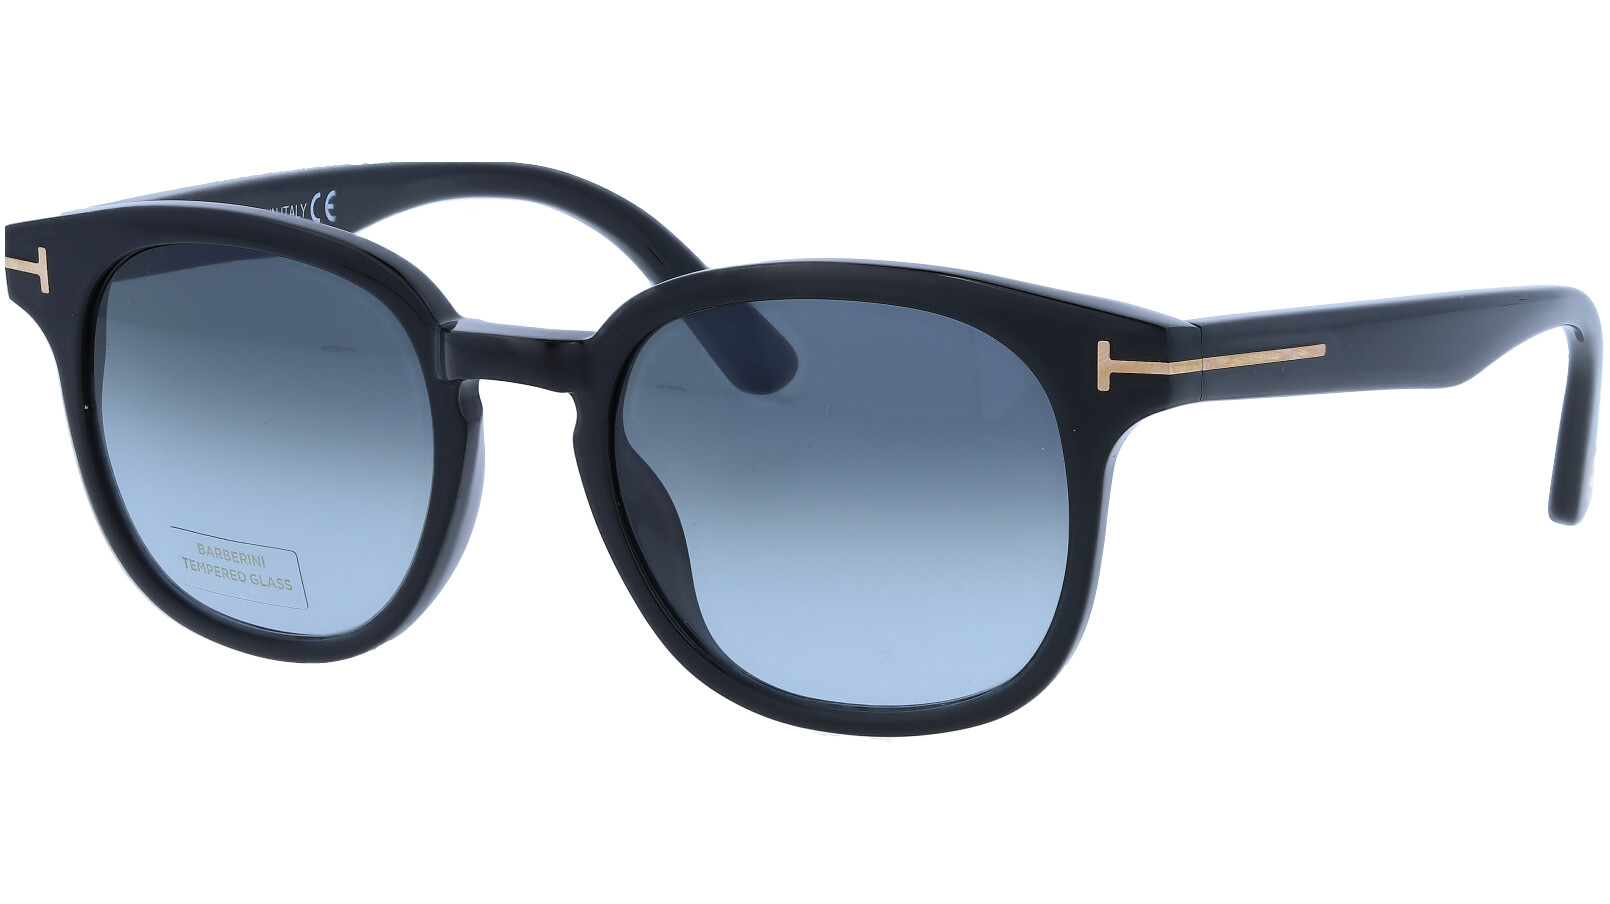 Tom Ford TF399 01N 50 Black Sunglasses